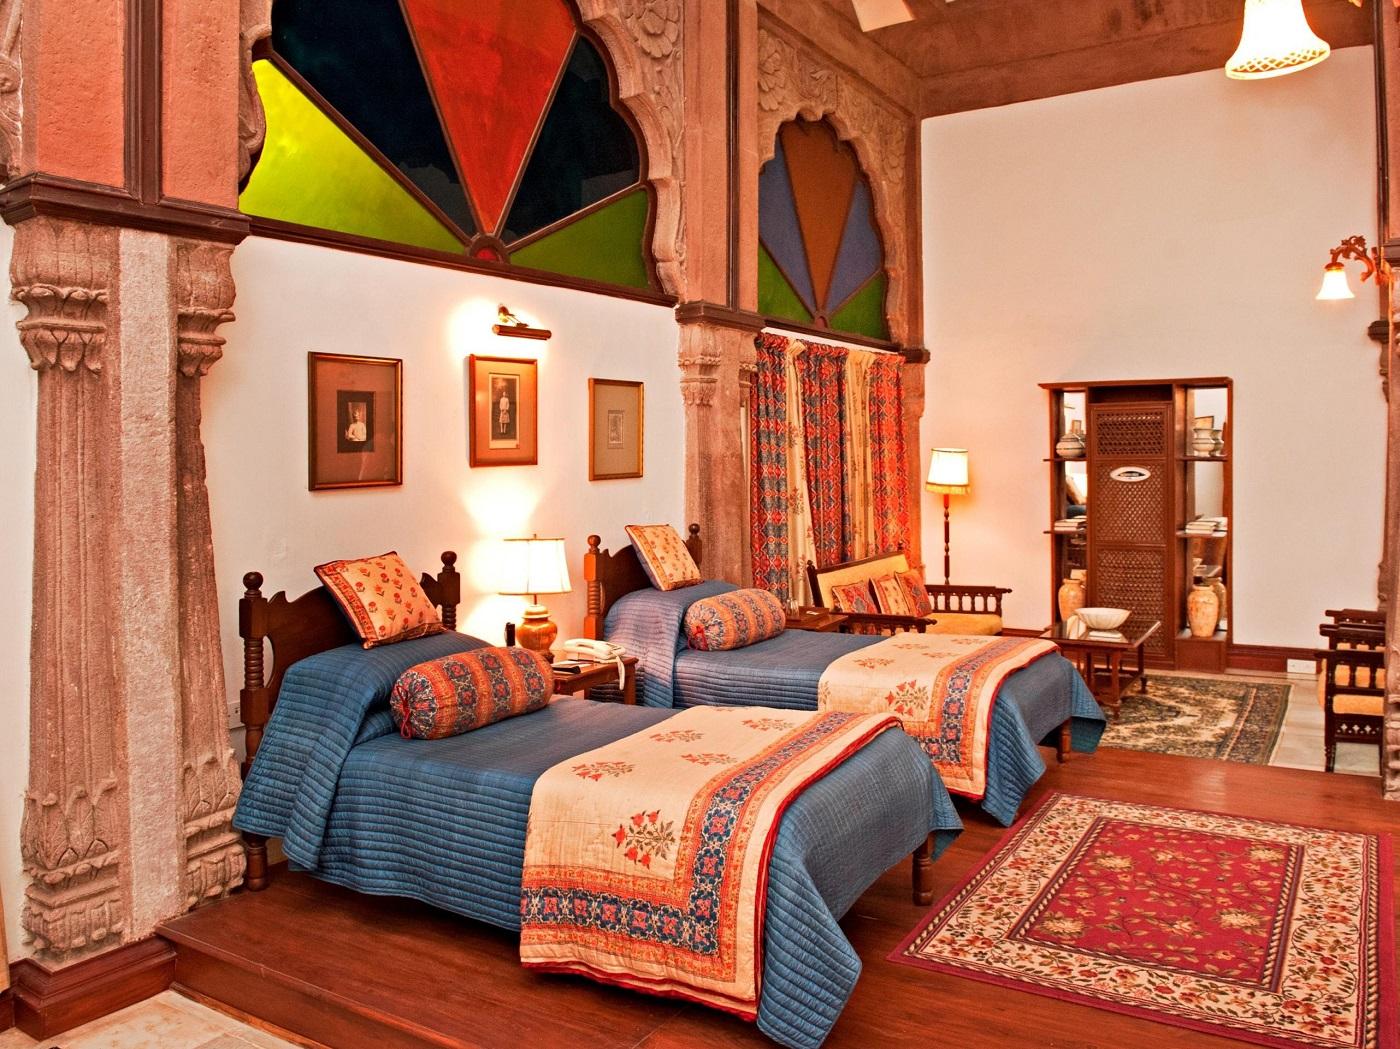 Balsamand Lake Palace Suite, Jodhpur